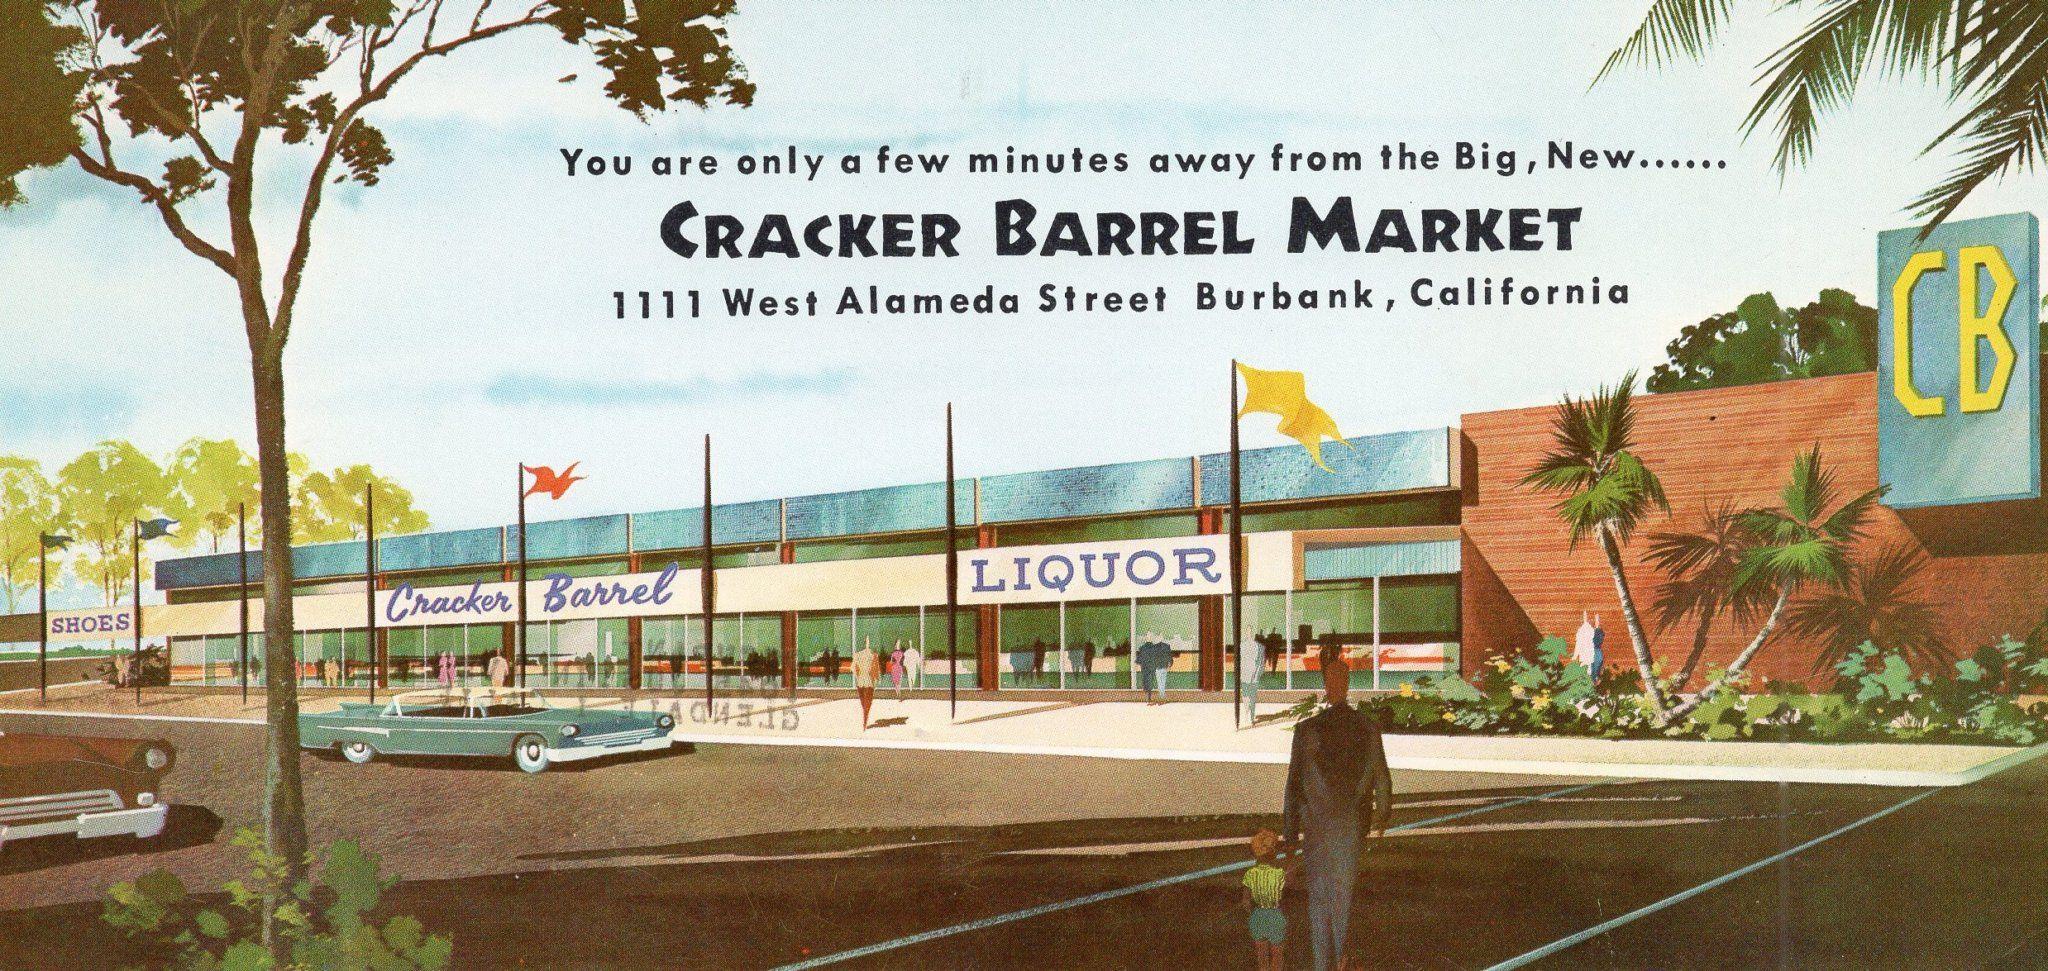 A Vintage 1959 Advertising Postcard Of The New Cracker Barrel